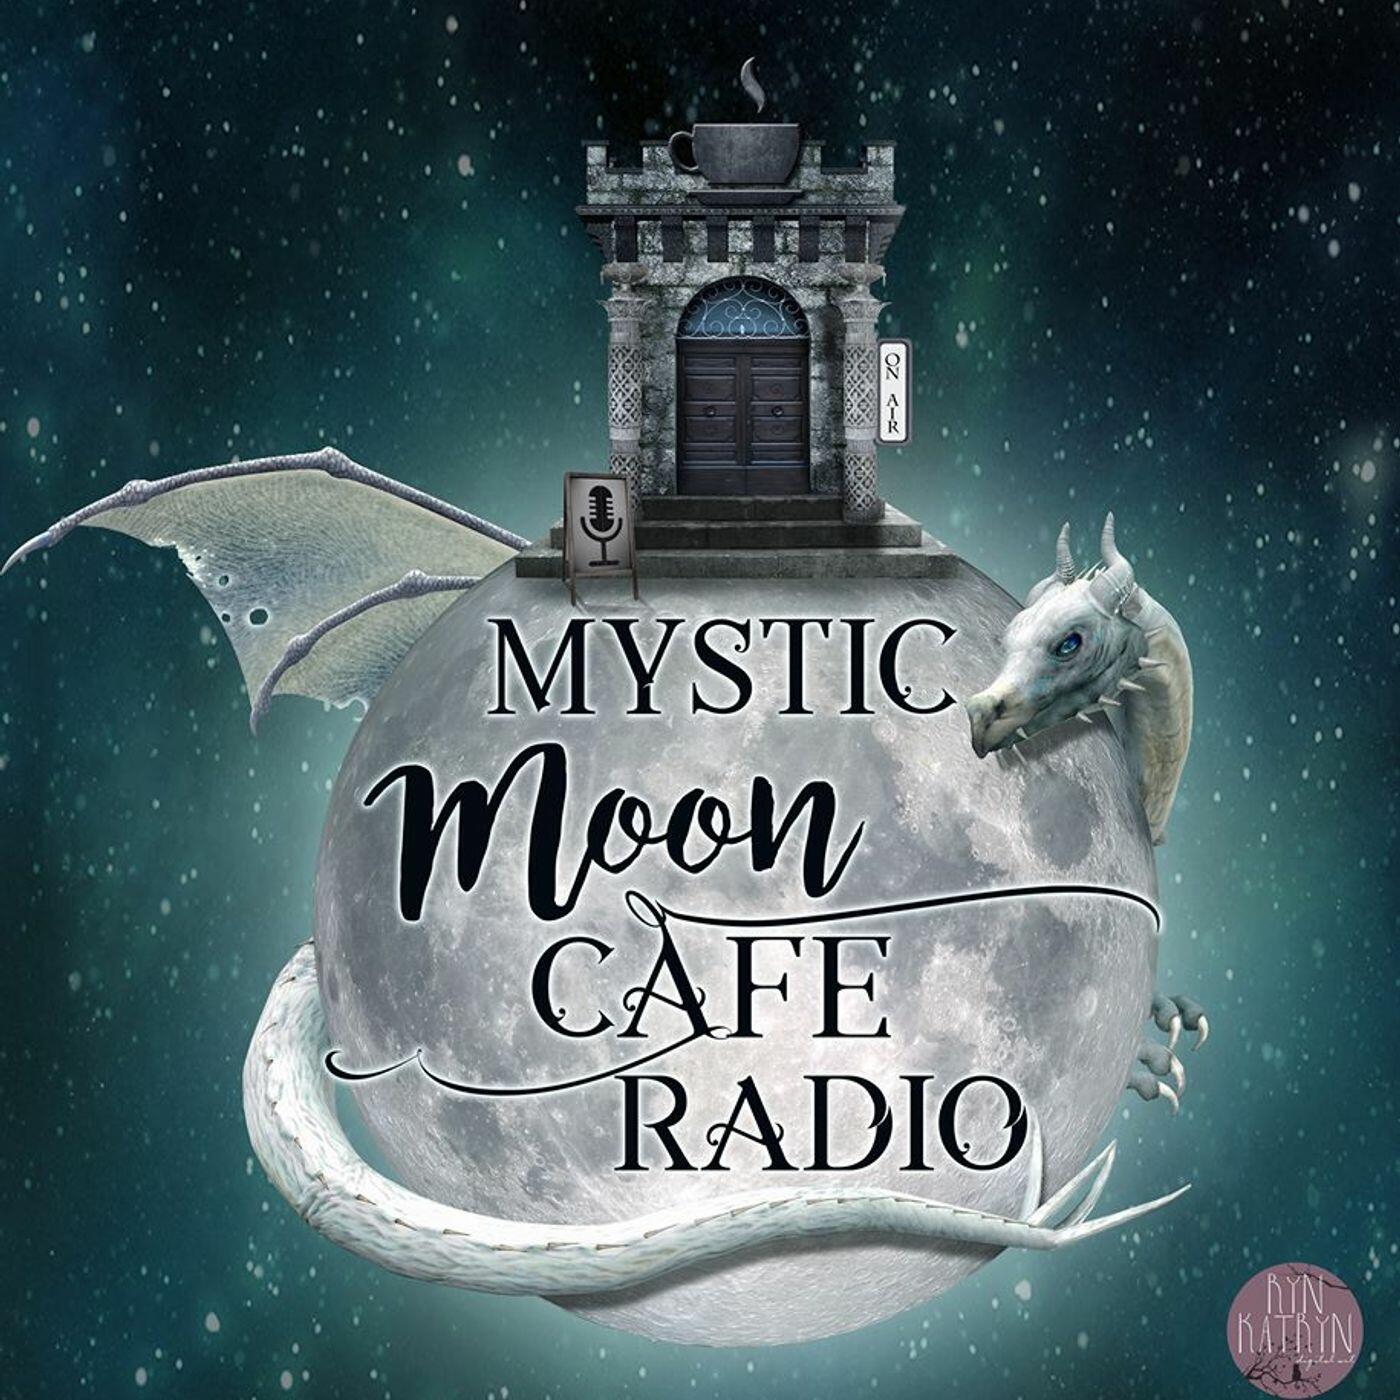 Mystic Moon Cafe